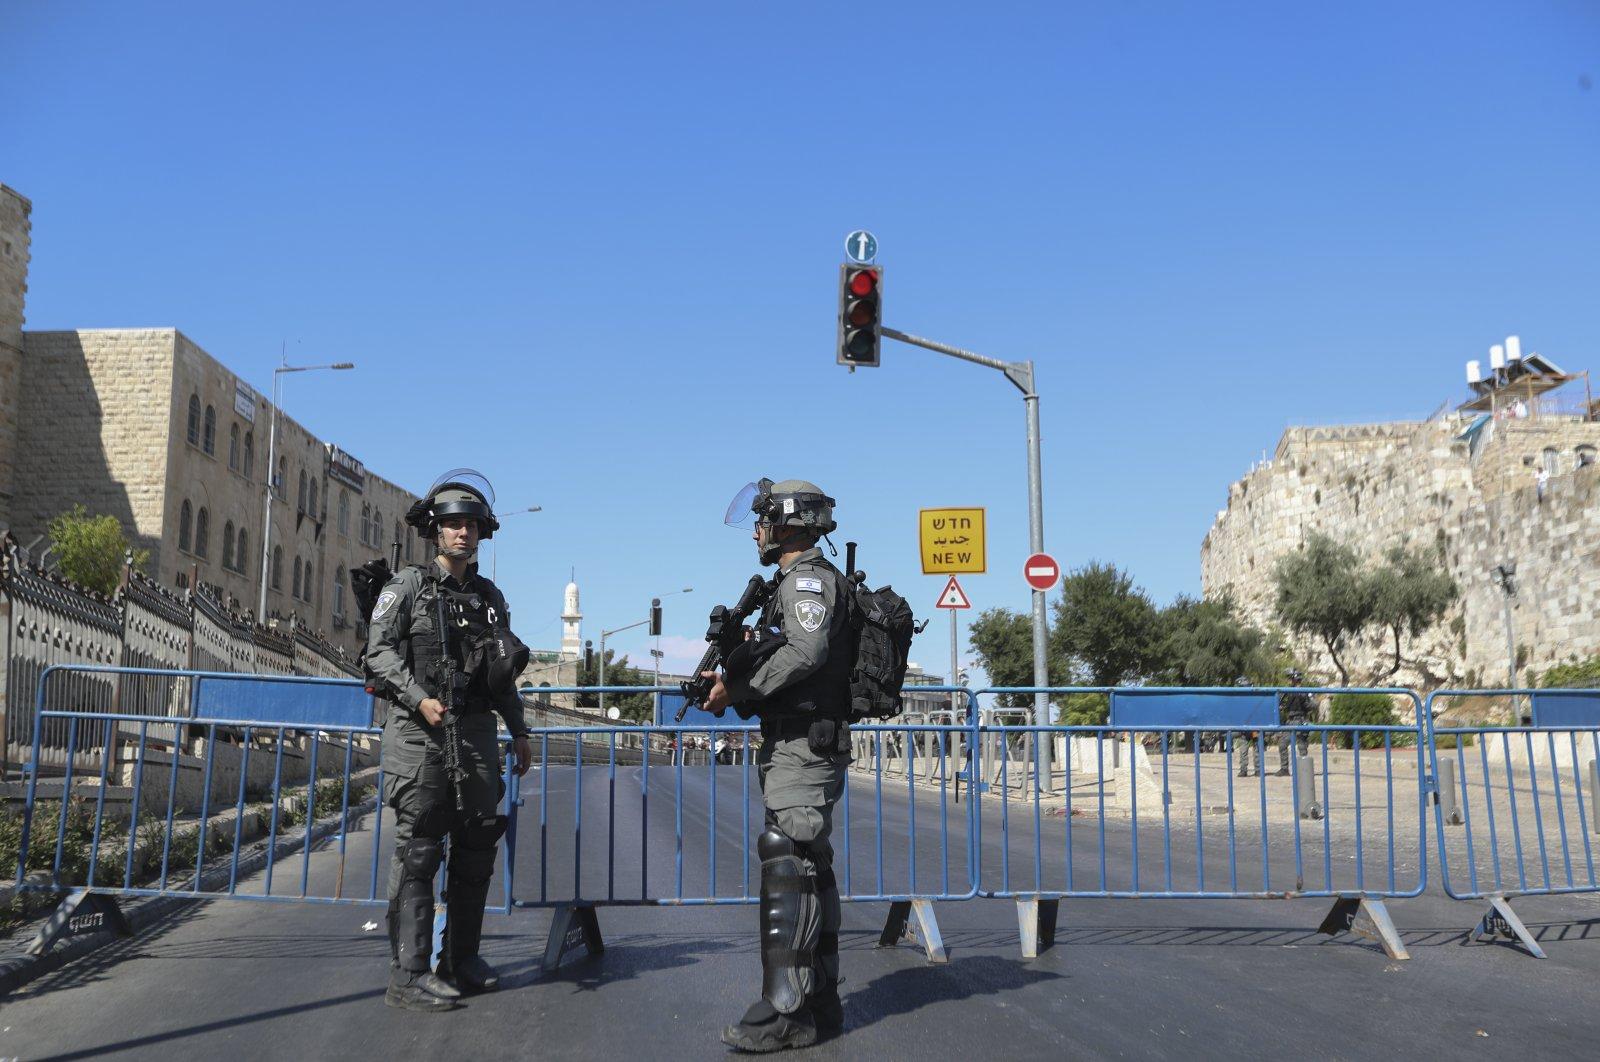 Israeli border police block a main road outside Jerusalem's Old City, June 15, 2021. (AP Photo)